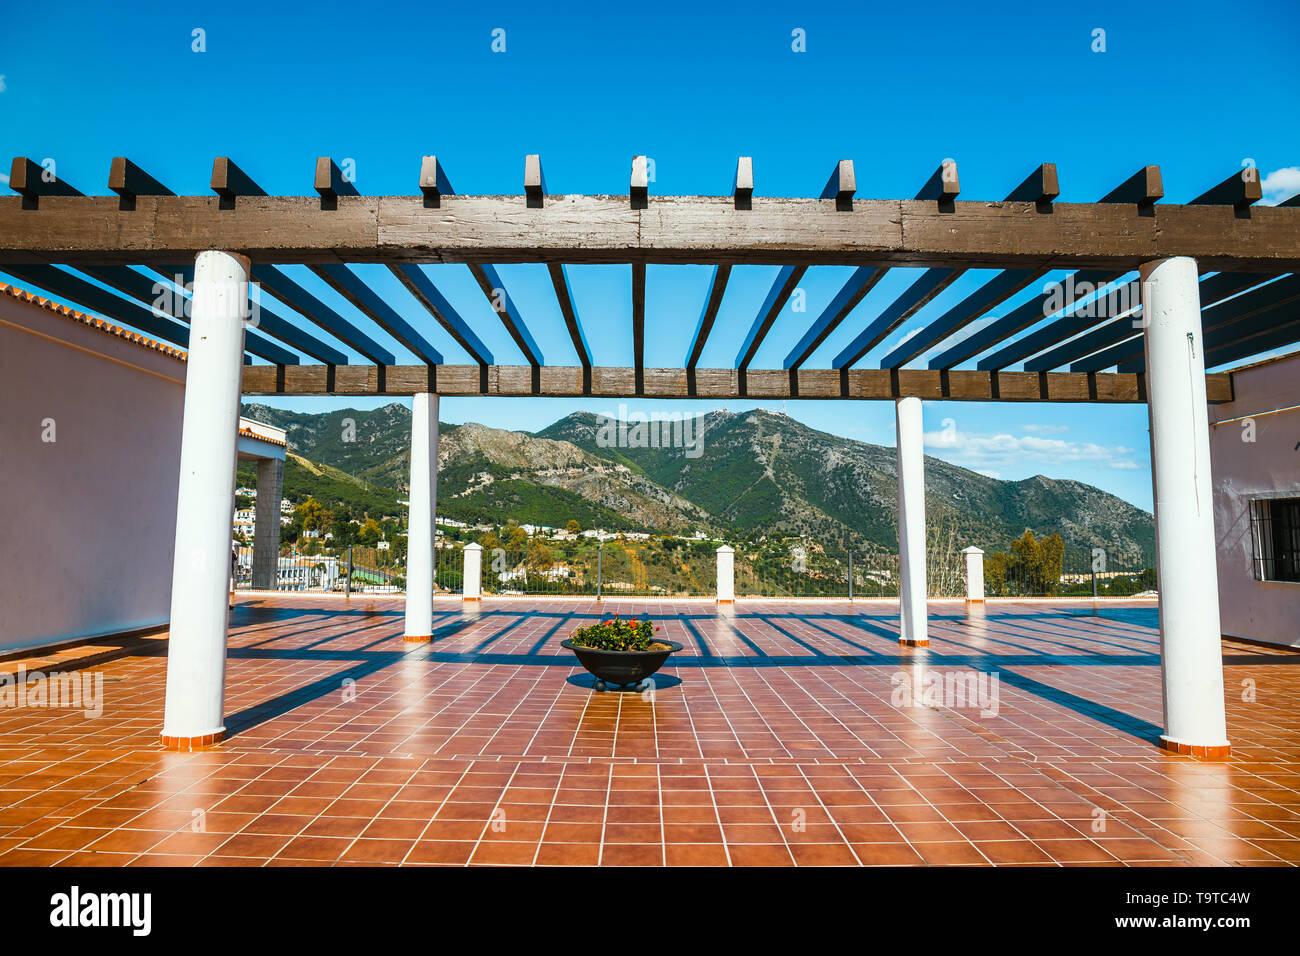 viewpoint in Mijas near malaga, Andalusia, Spain - Stock Image